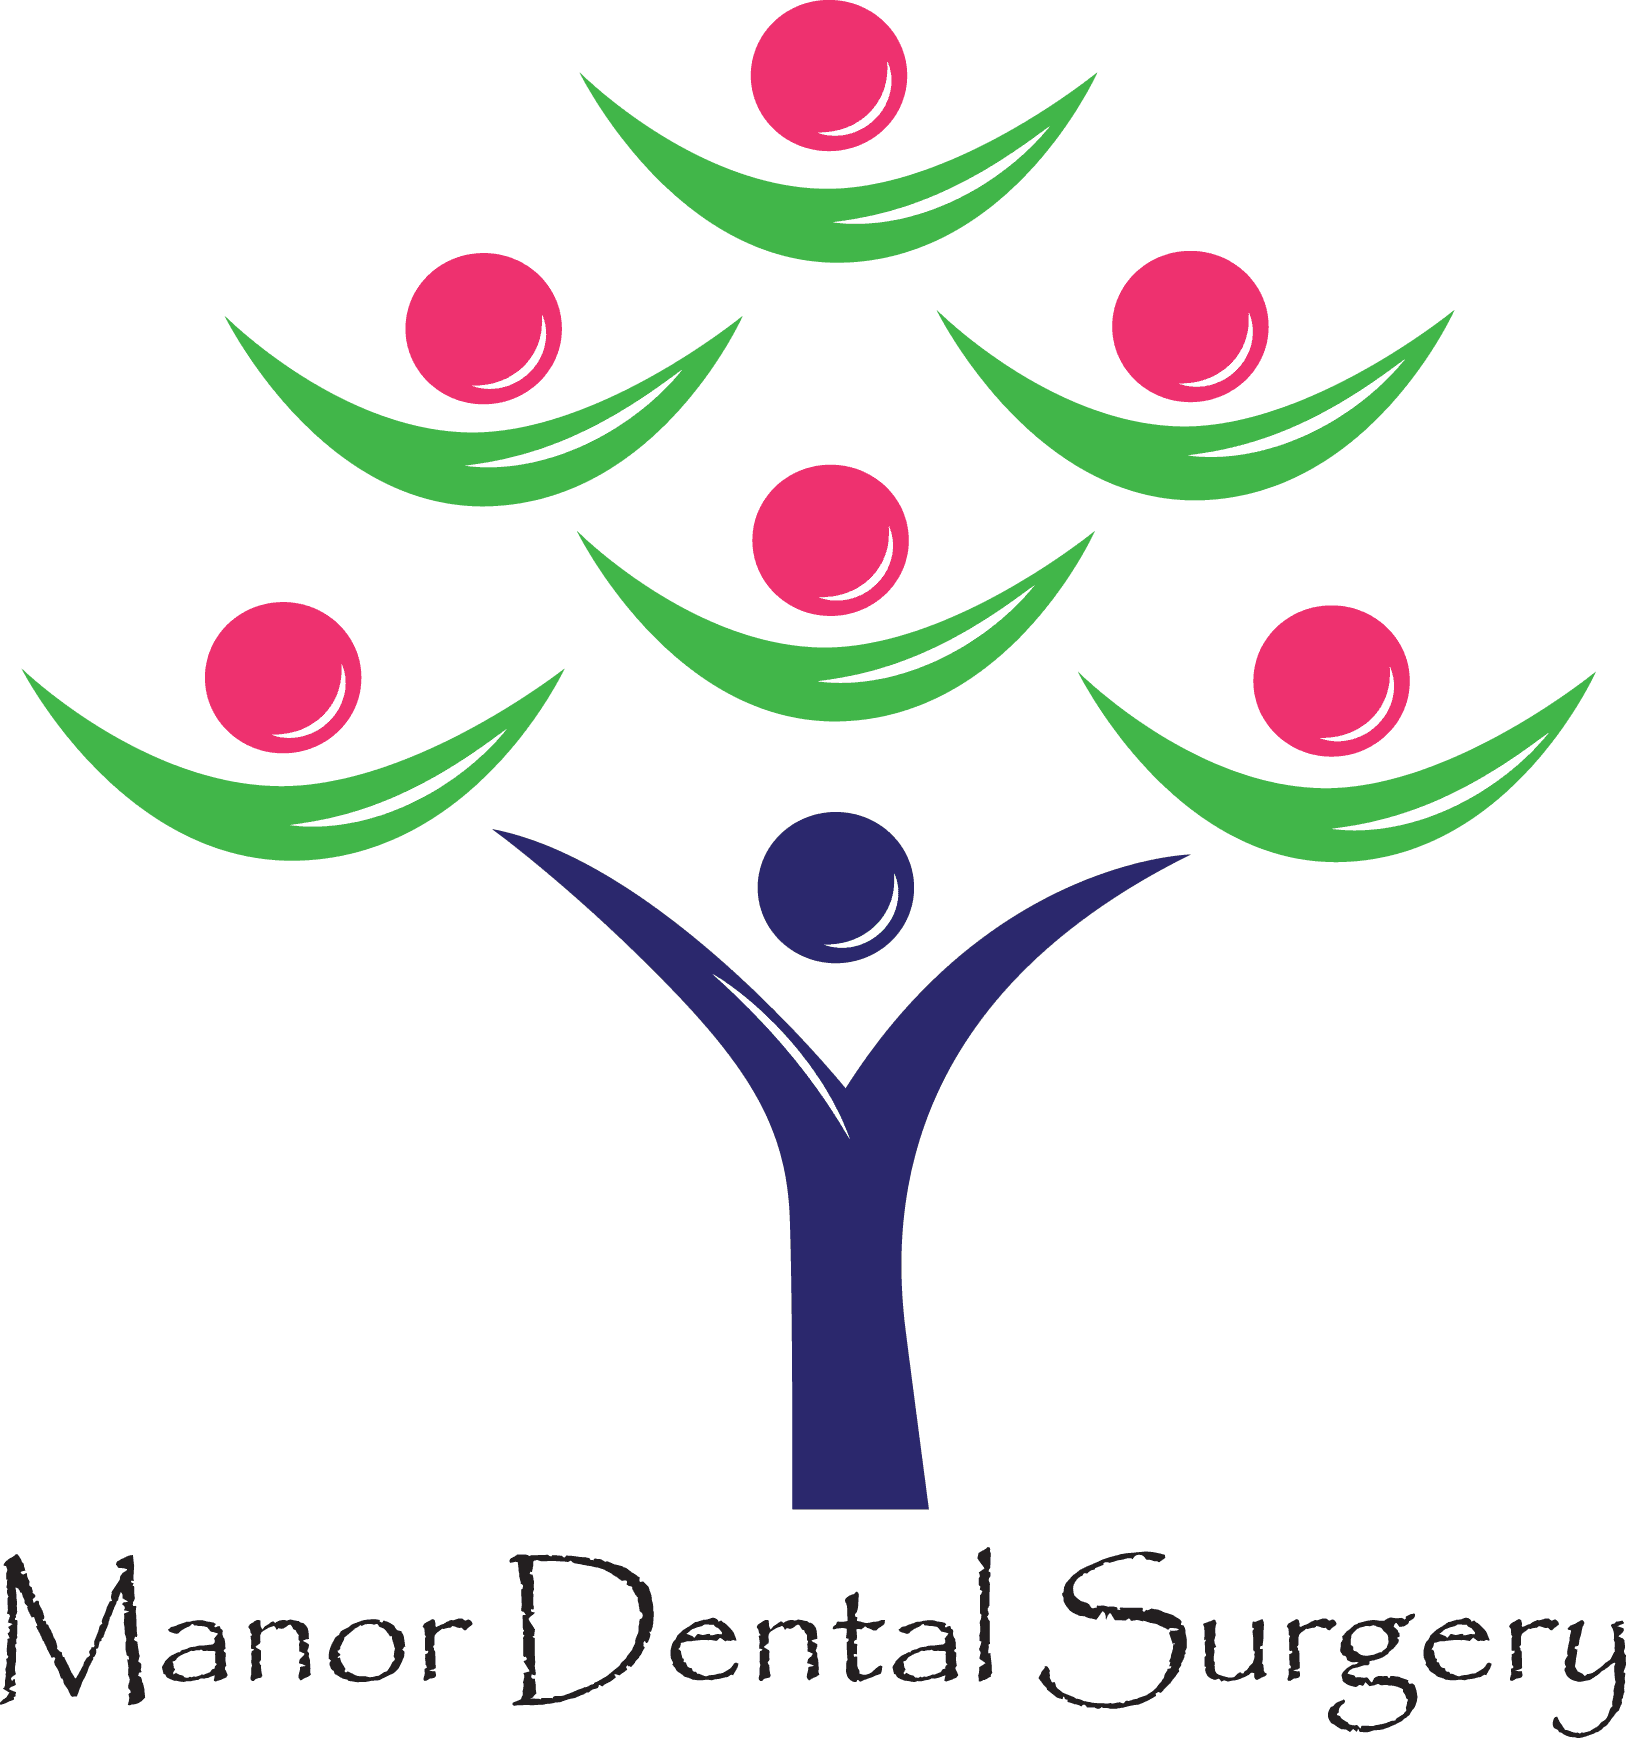 Manor Dental Surgery logo